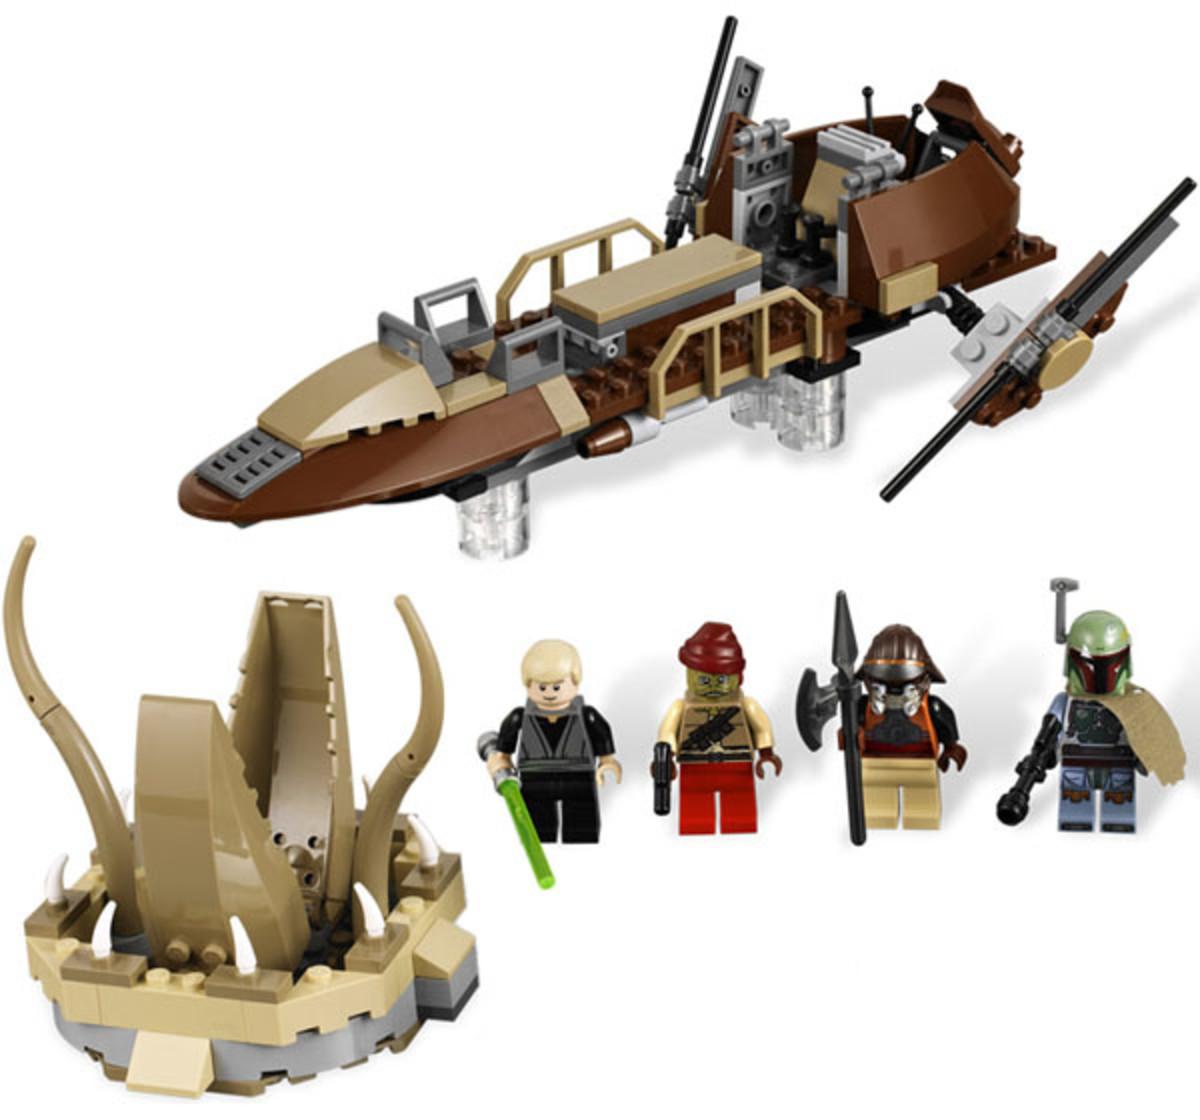 LEGO Star Wars Desert Skiff 9496 Assembled